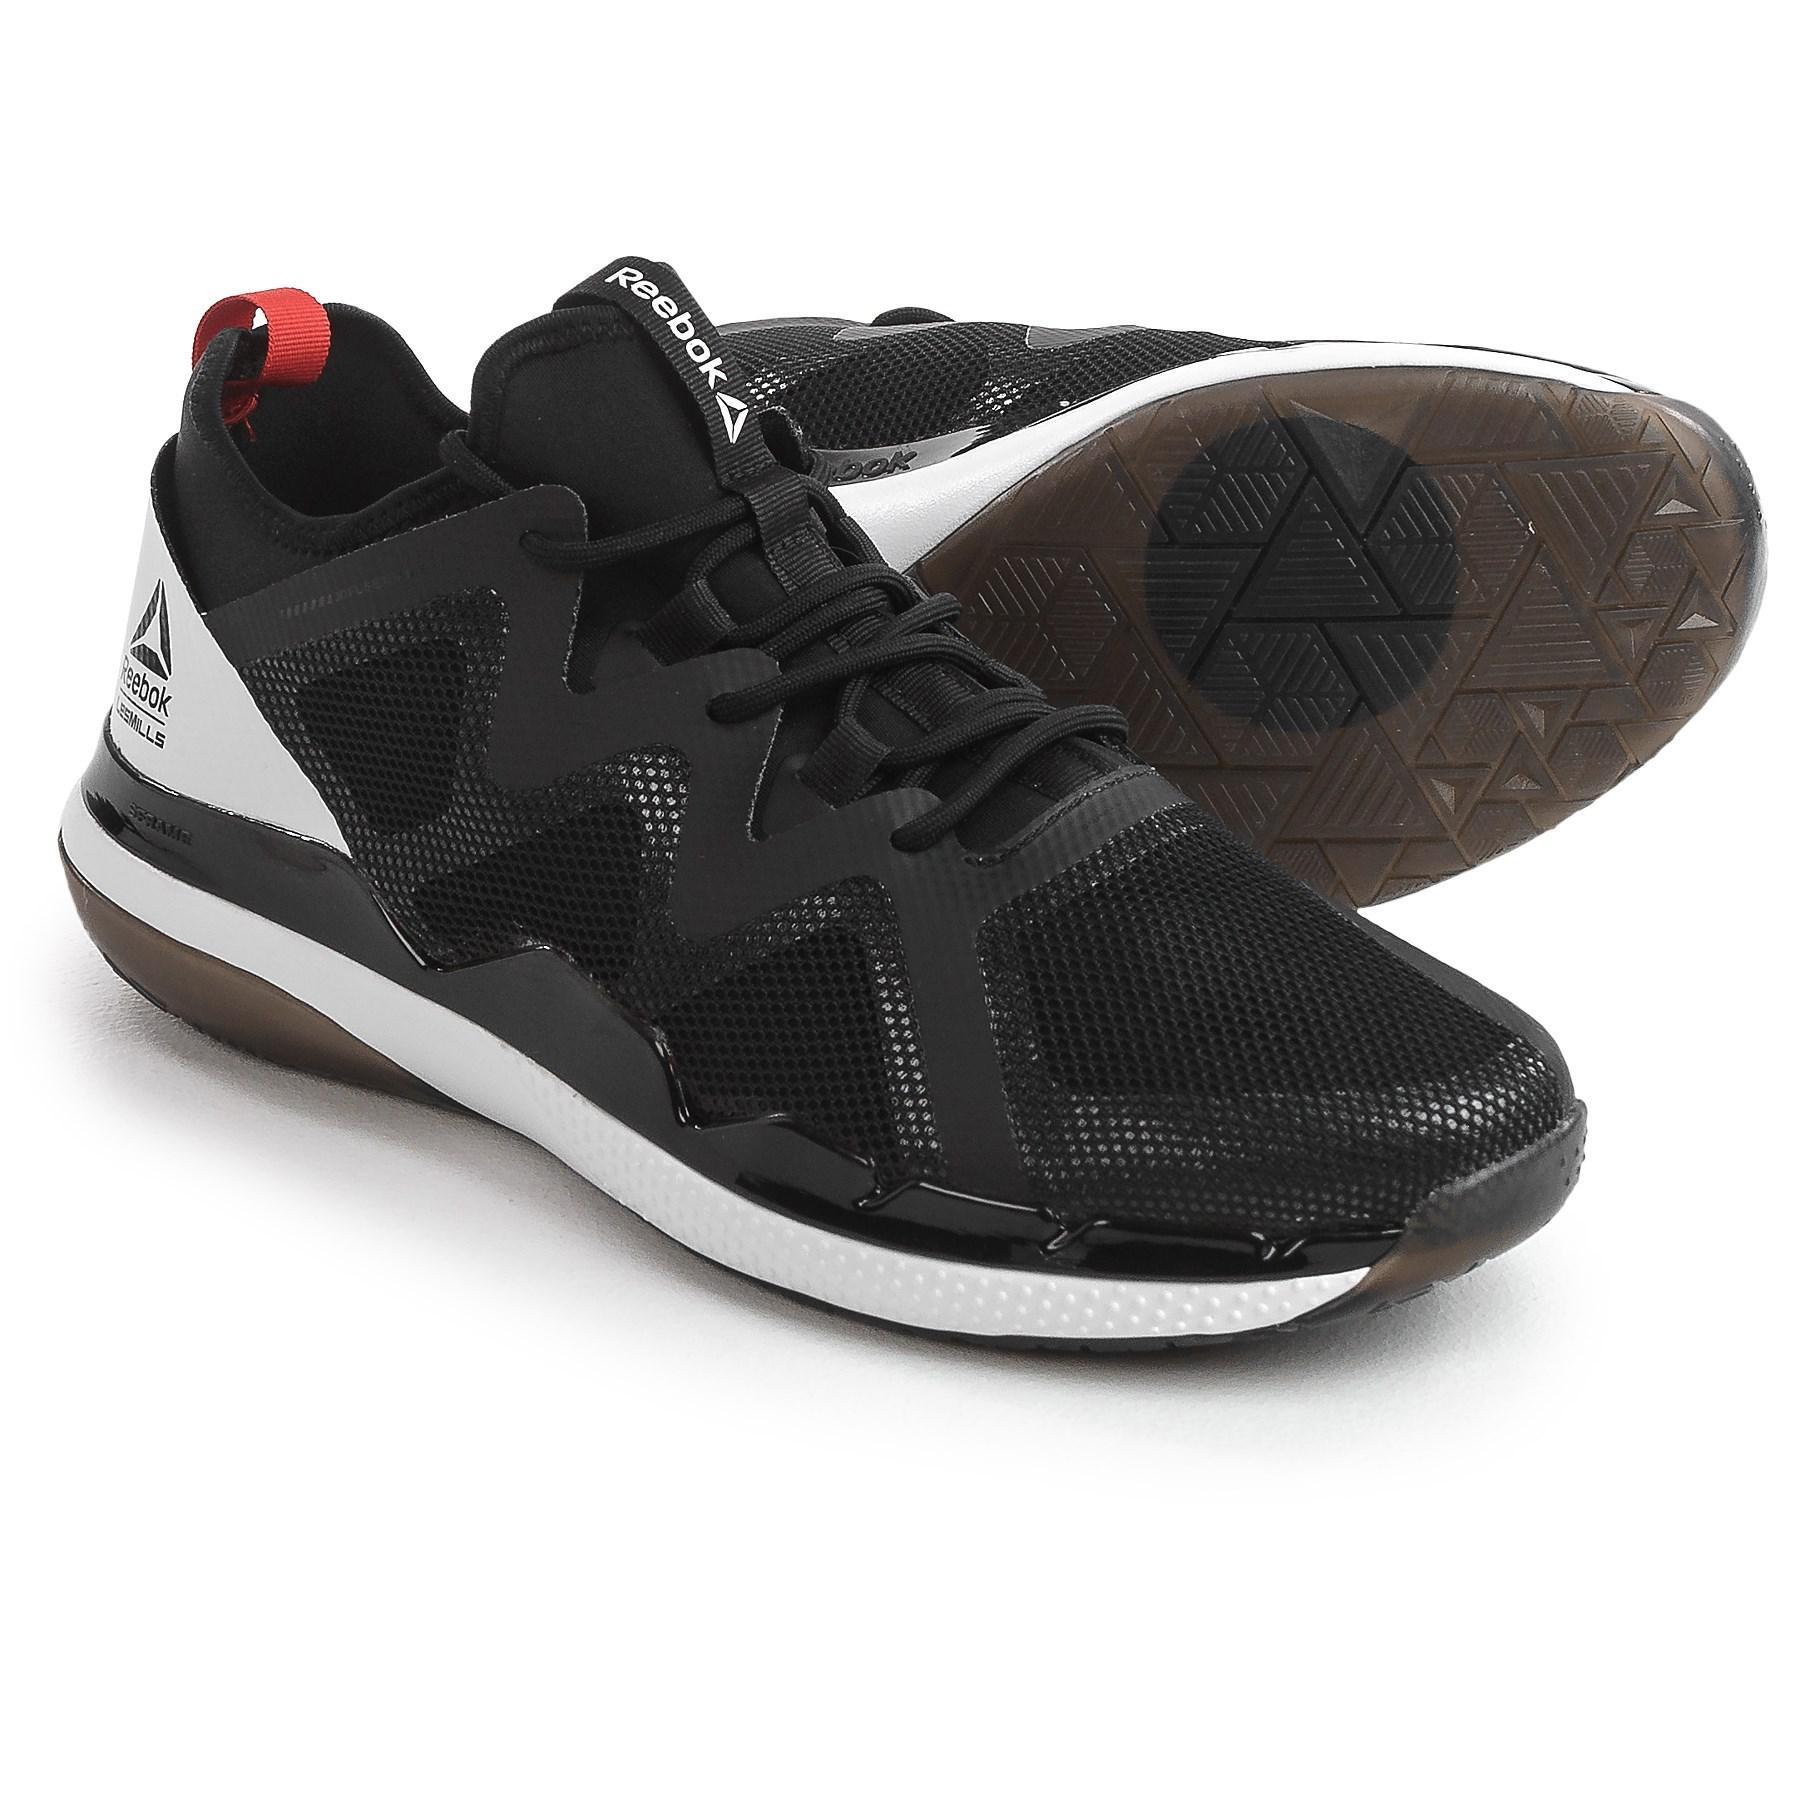 197940081 Lyst - Reebok Ultra 4.0 Lm Training Shoes (for Men) in Black for Men